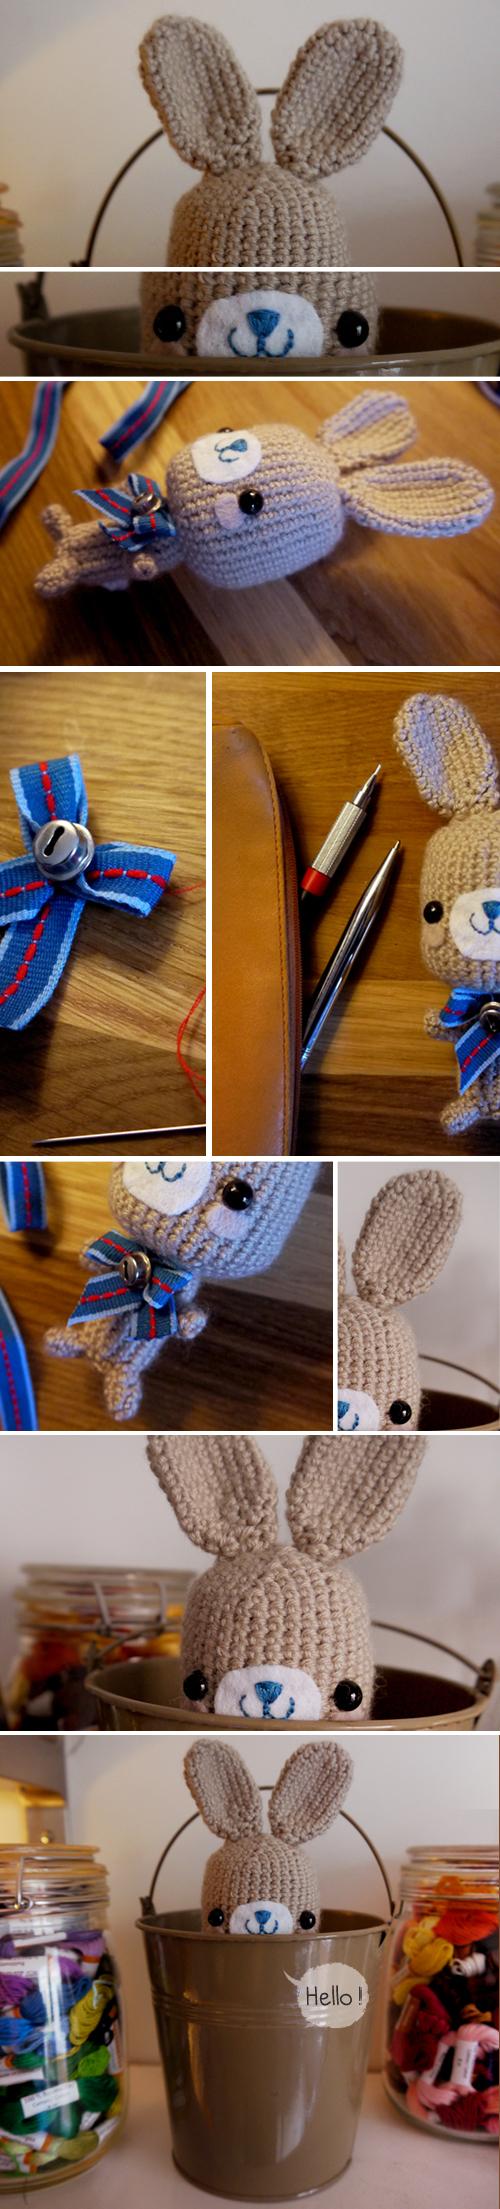 Cute little animal crocheted